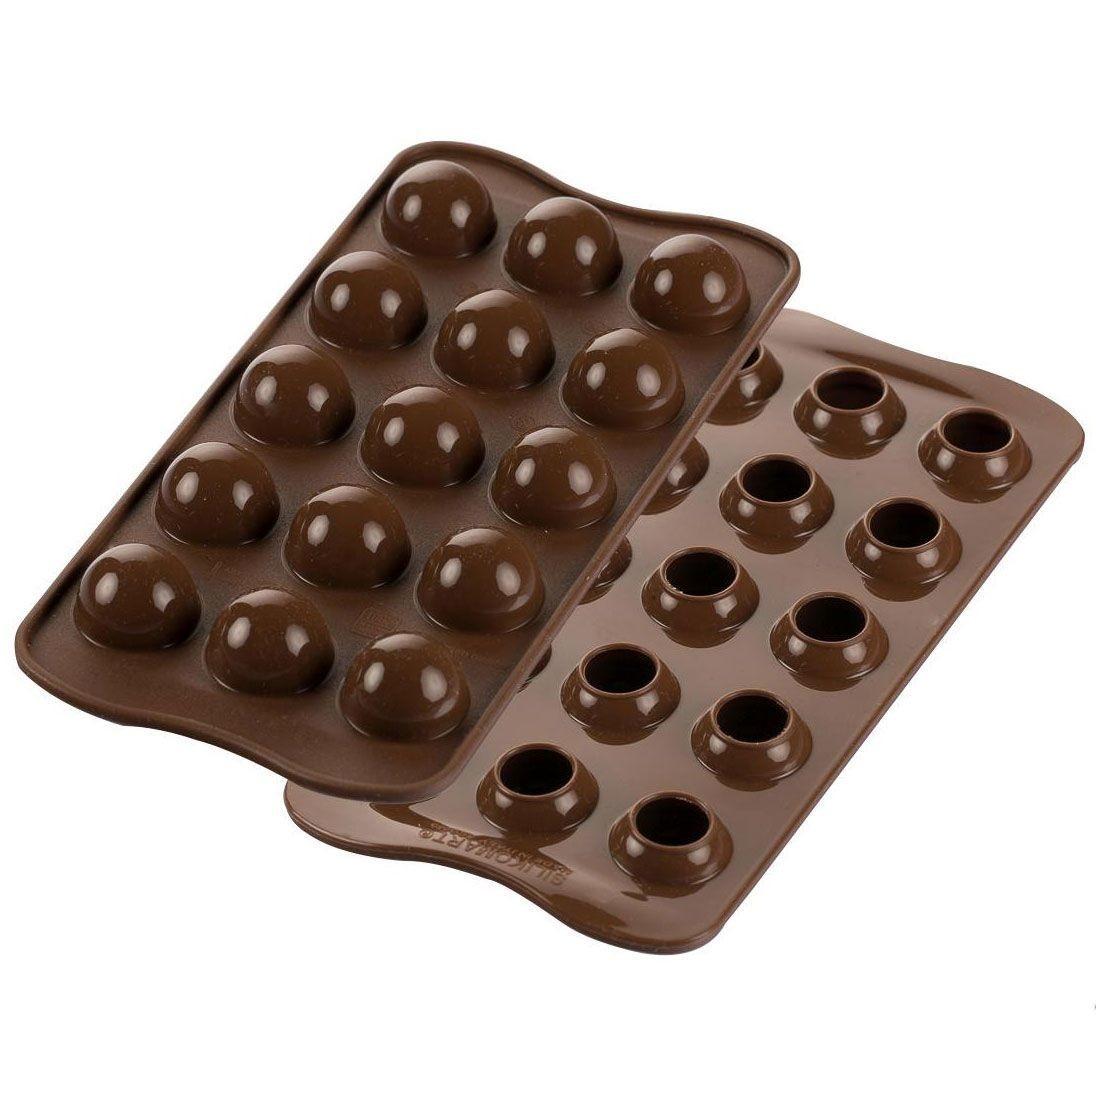 Silikomart Chocolate Mould Tartufino Sphere Truffle Mould - Καλούπι για σφαιρικά σοκολατάκια